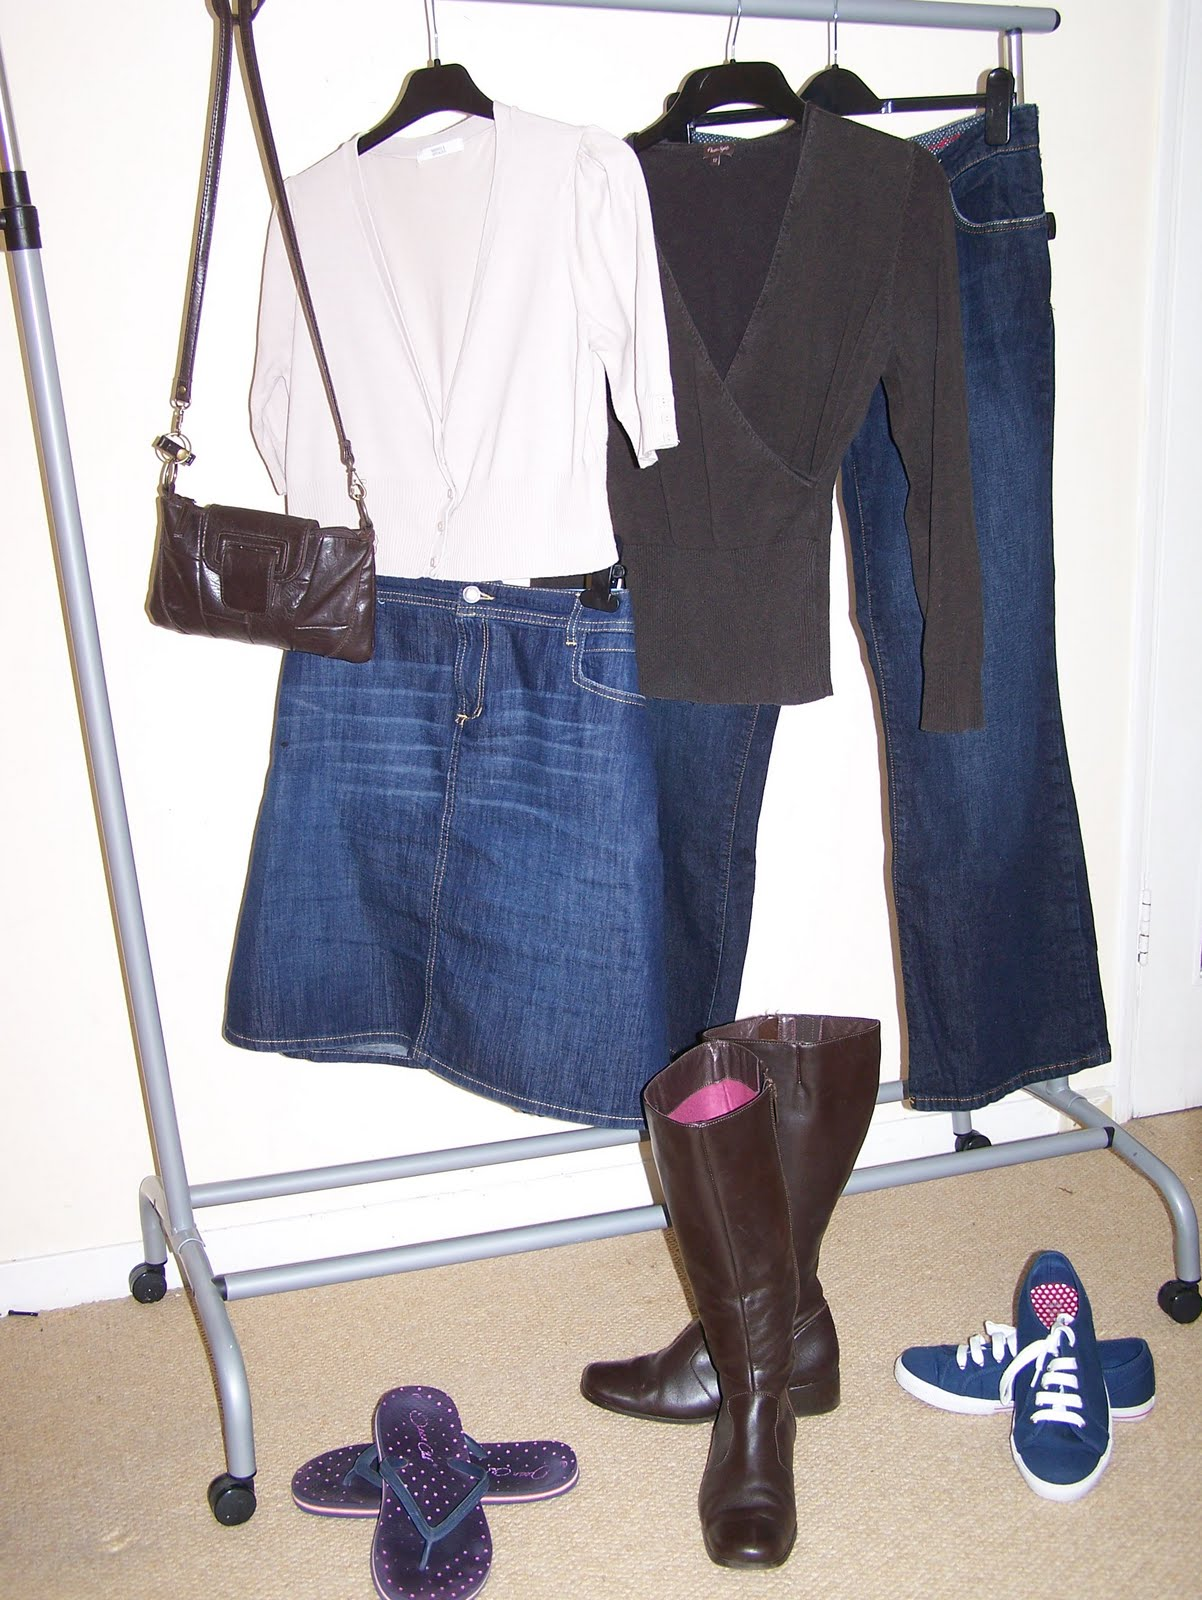 Chic and Minimalist Wardrobe Wardrobe Essentials for Women A